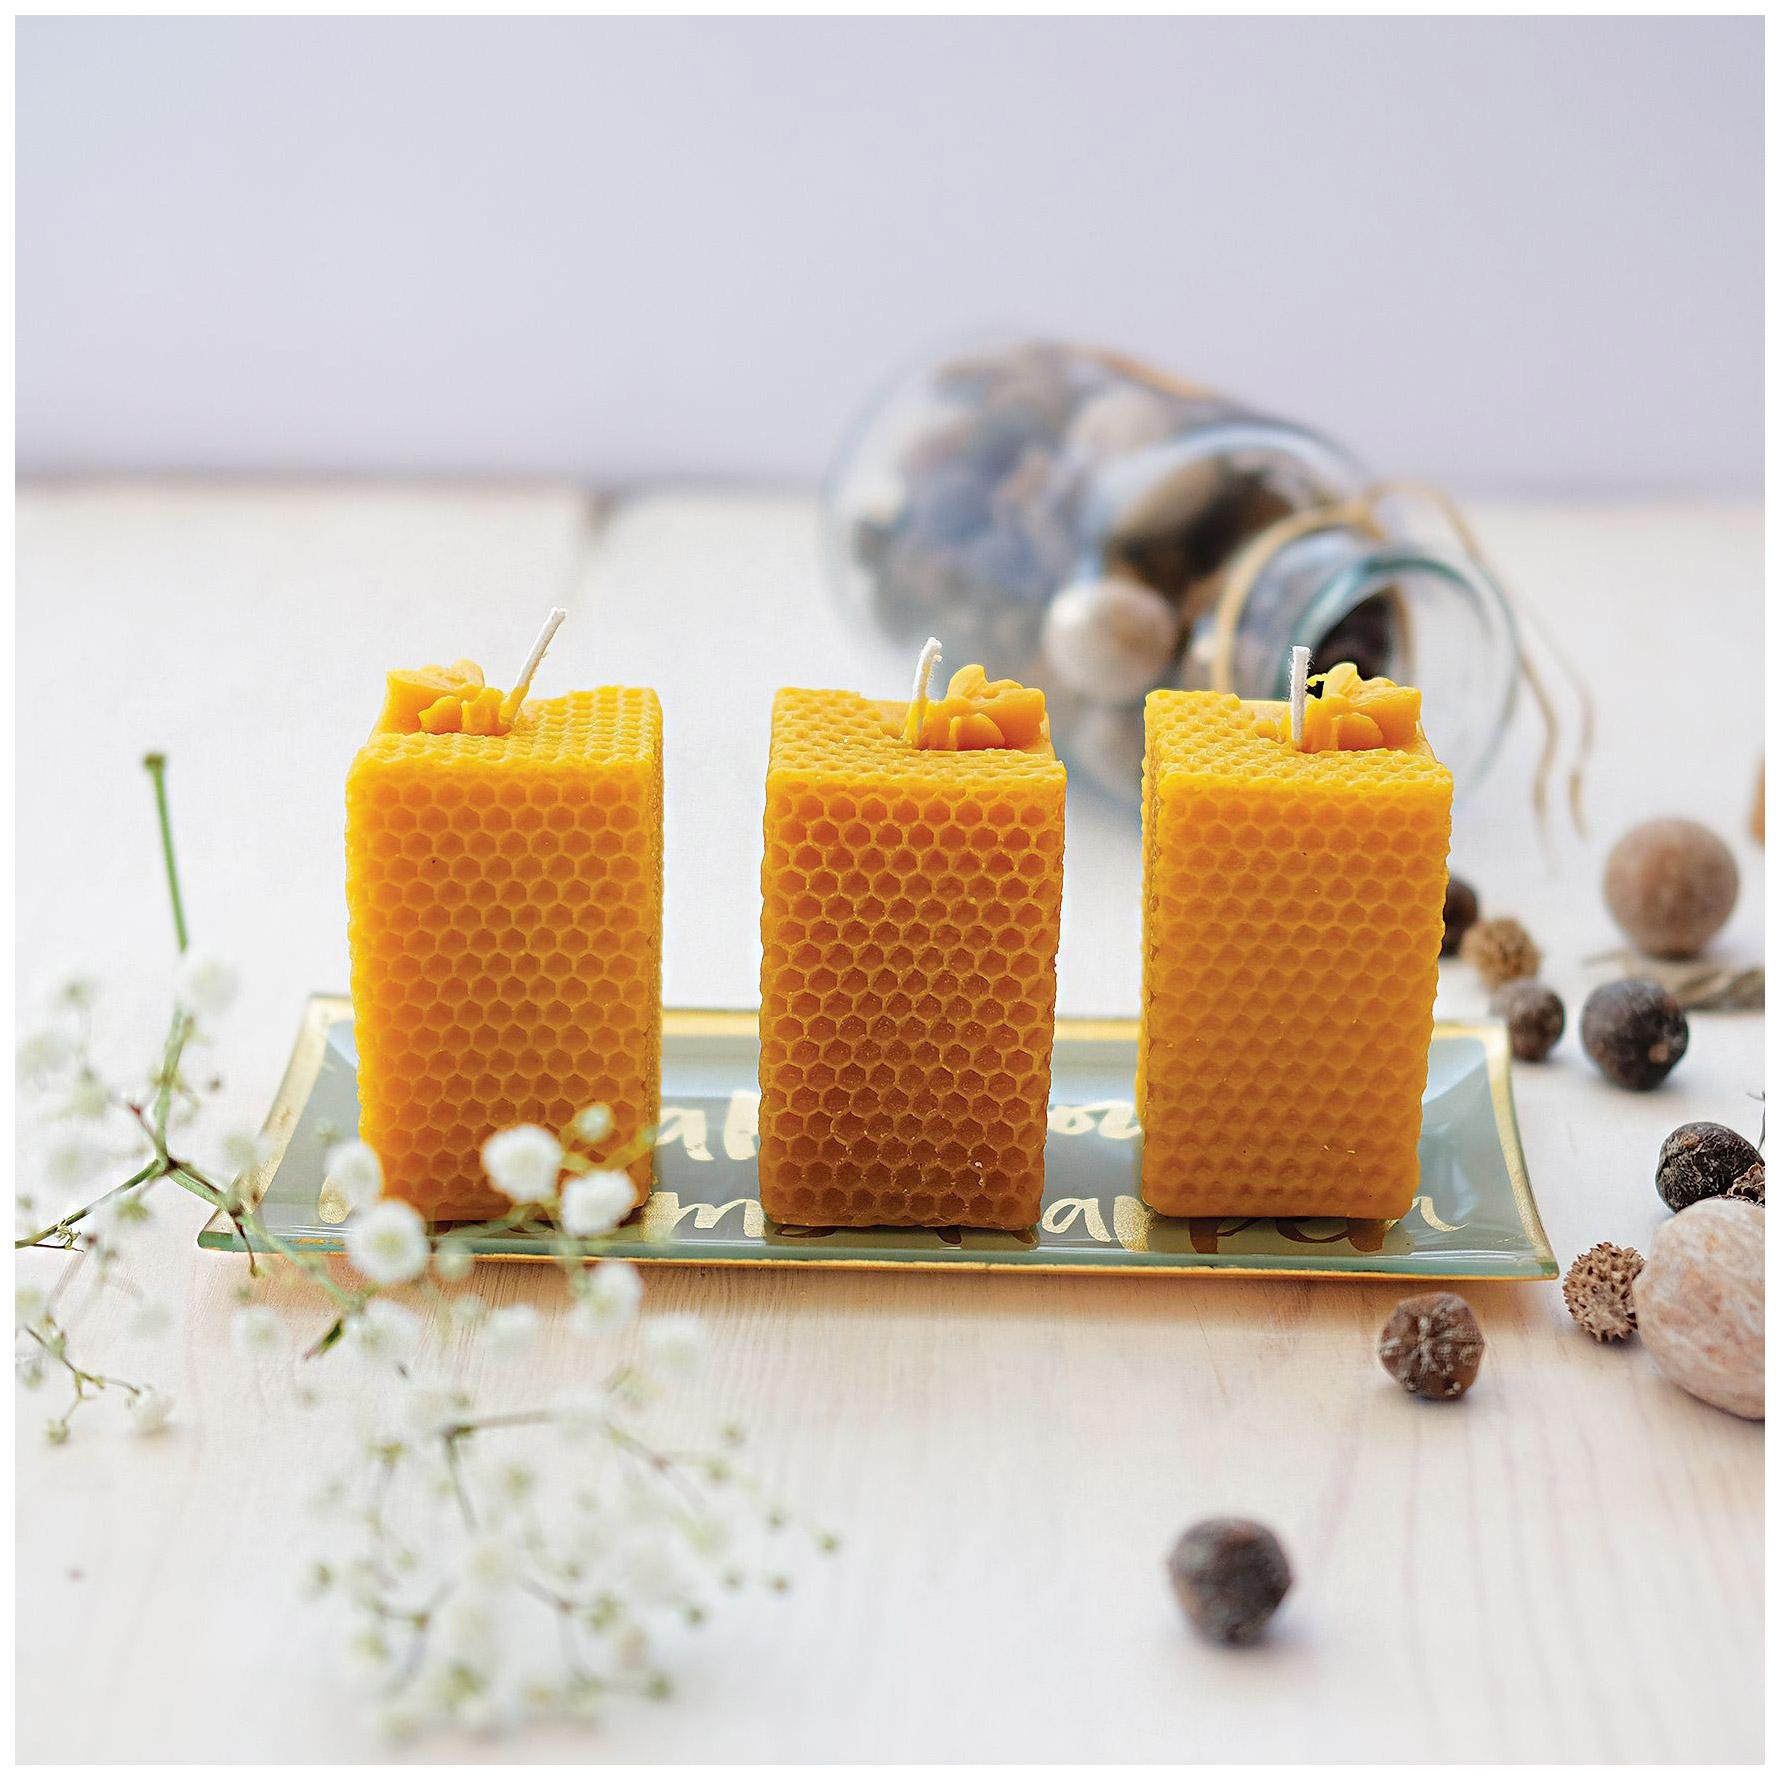 Beeswax Honeycomb Candles 100% Bees Wax